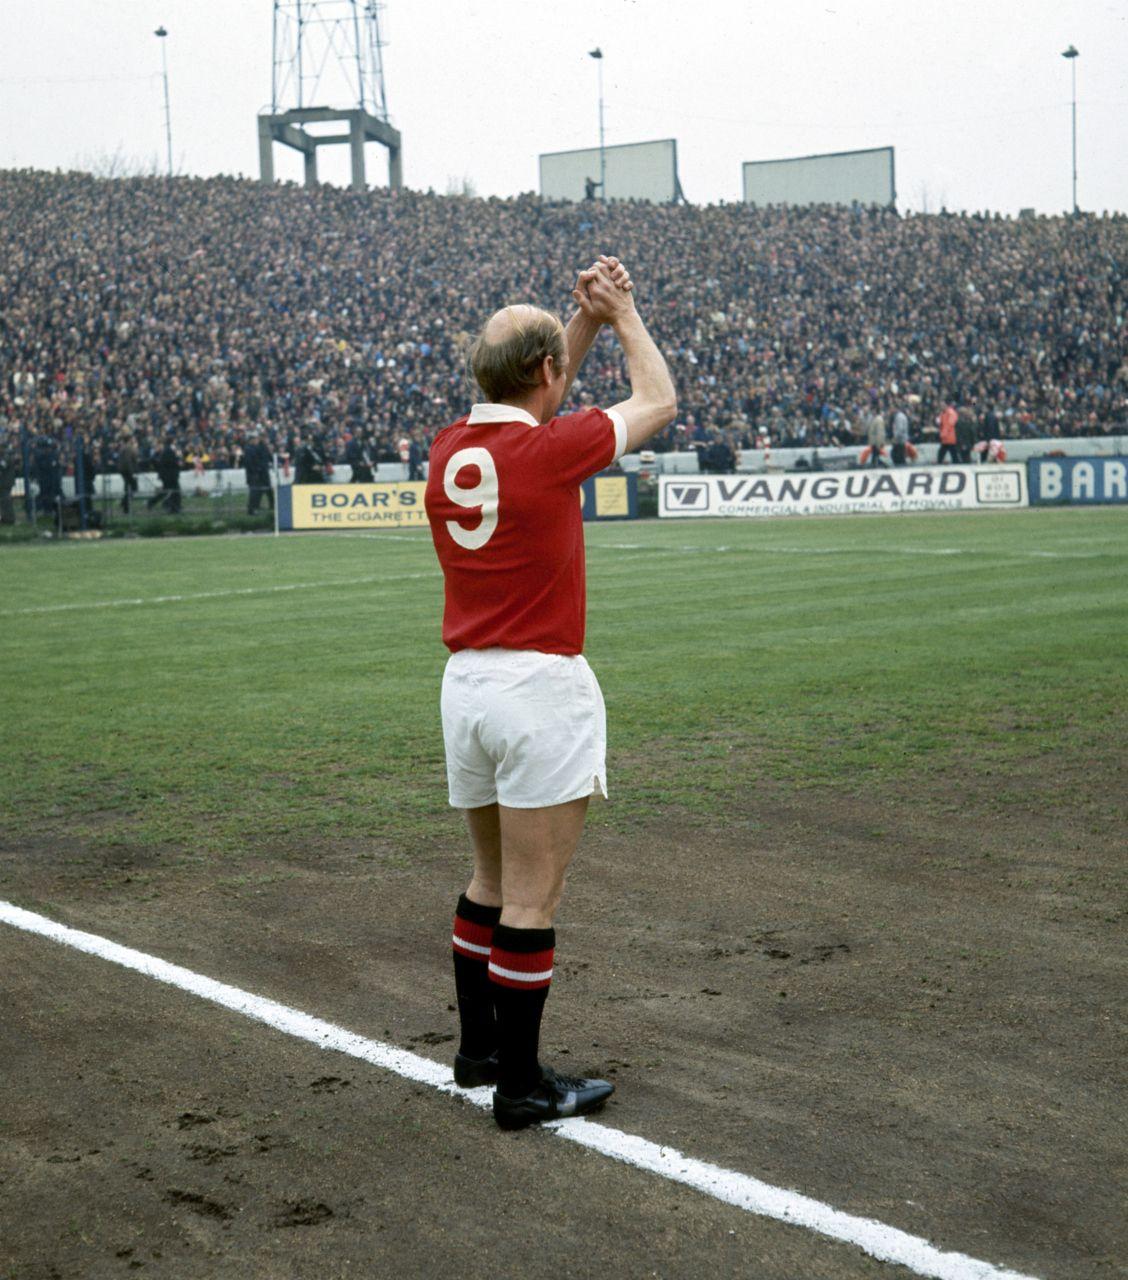 Bobby Charlton's final match for United, 1973. Bobby